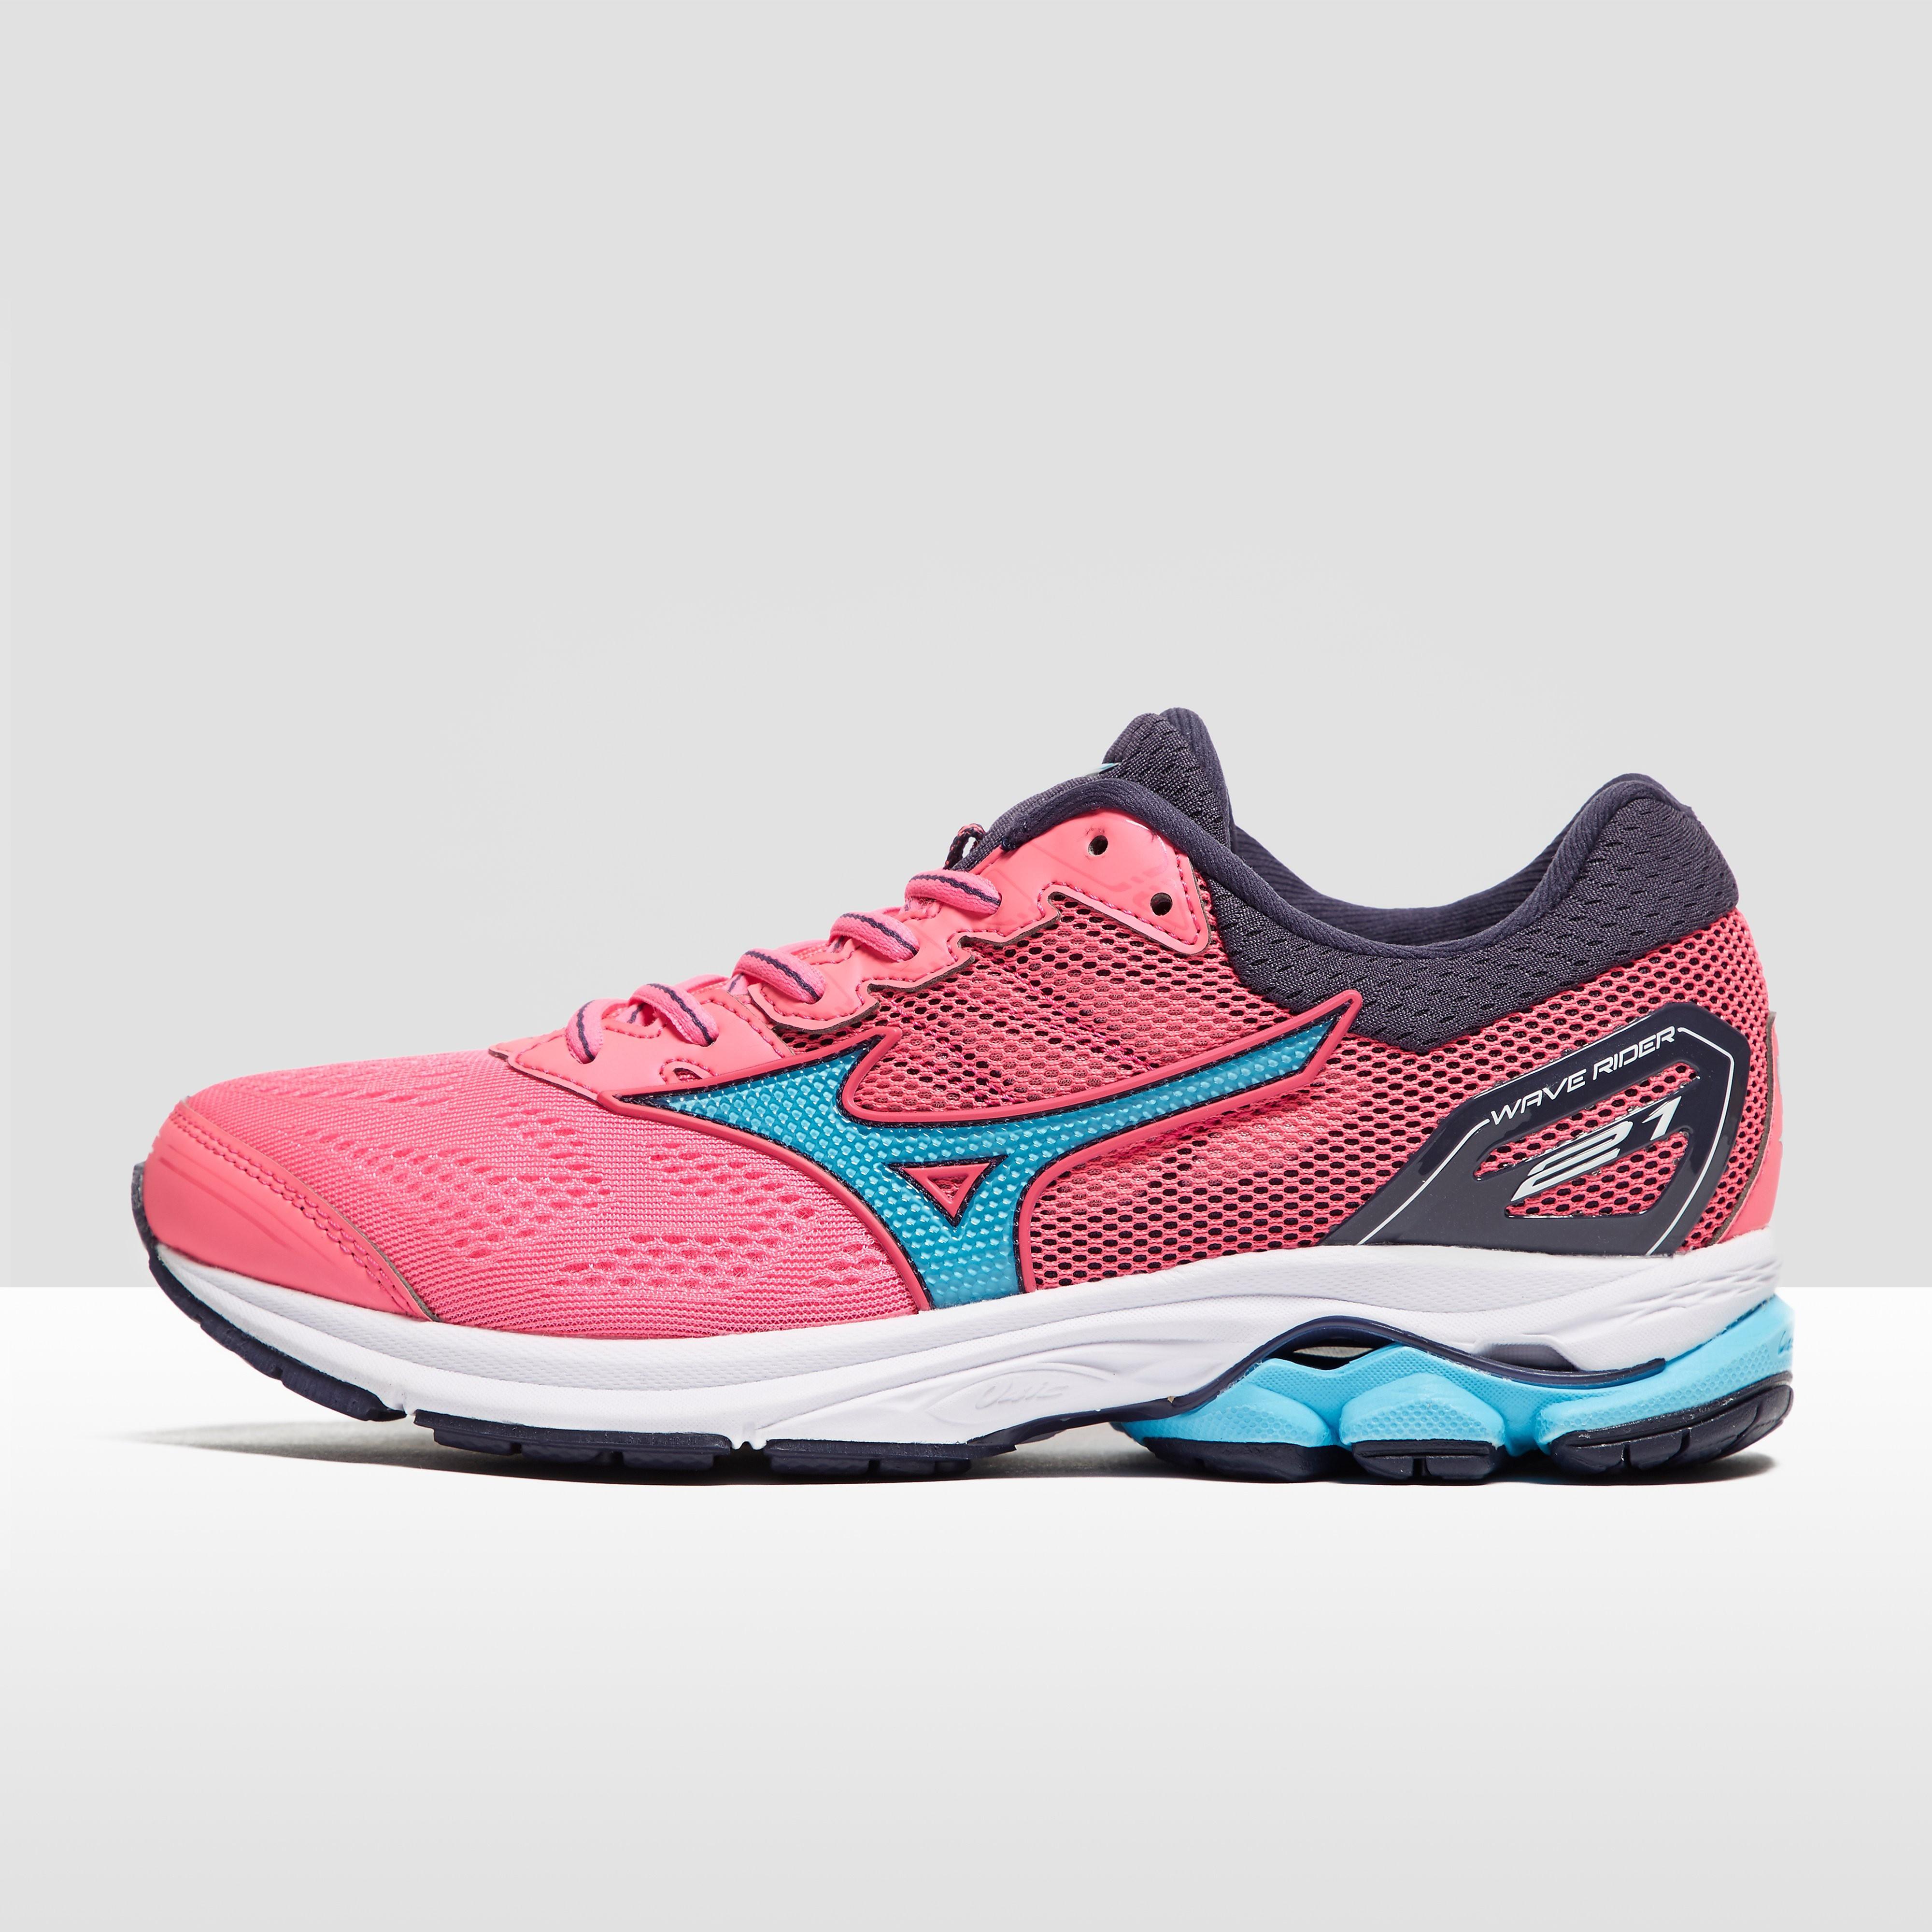 Mizuno Wave Rider 21 Women's Running Shoes